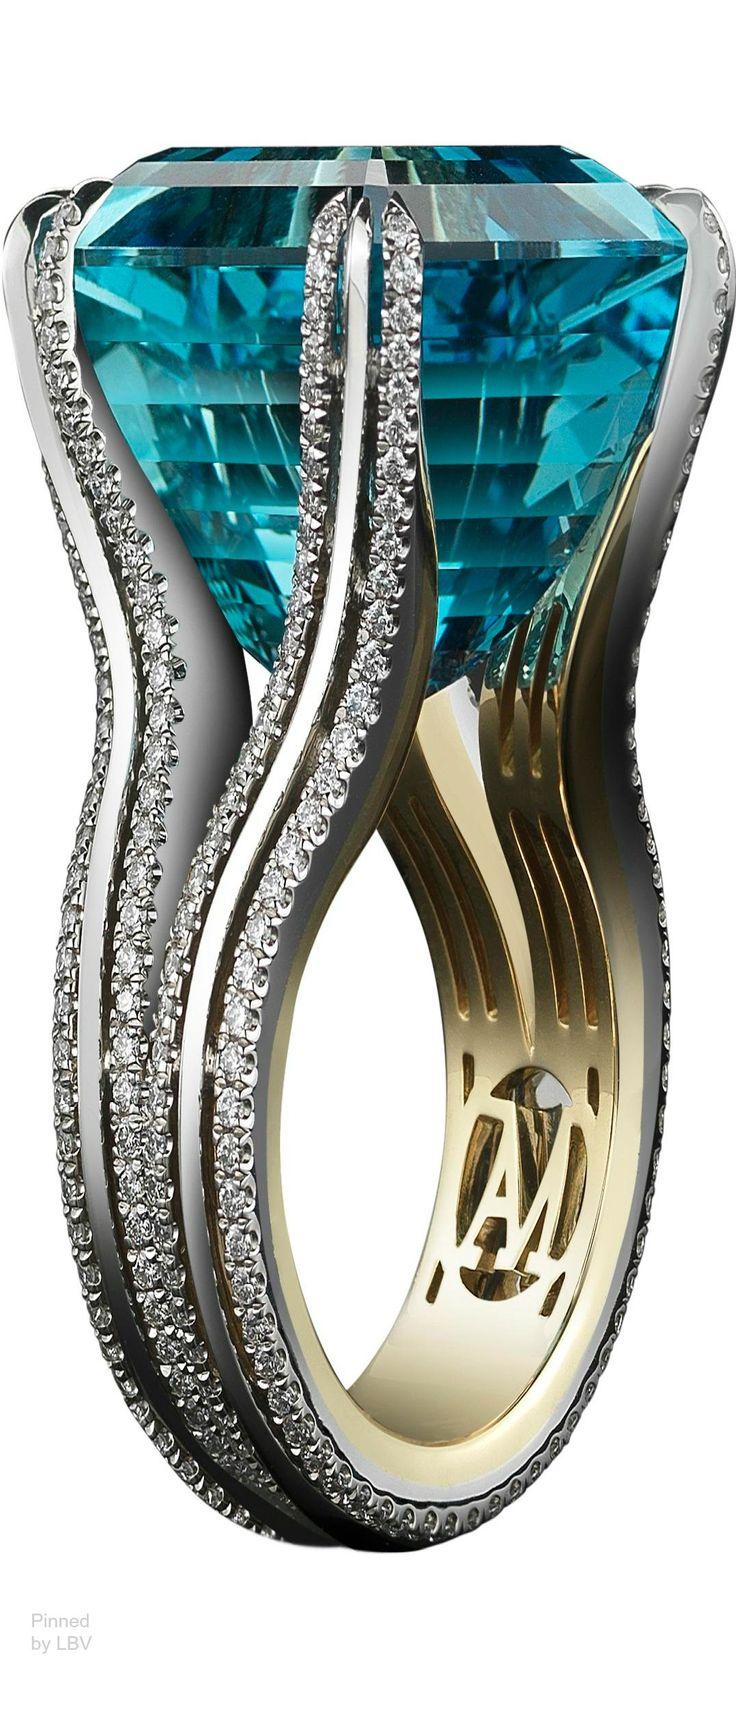 Alexandra Mor Asscher-Cut Intense Aquamarine & Diamond Ring - A very Elegant Ring....OMG